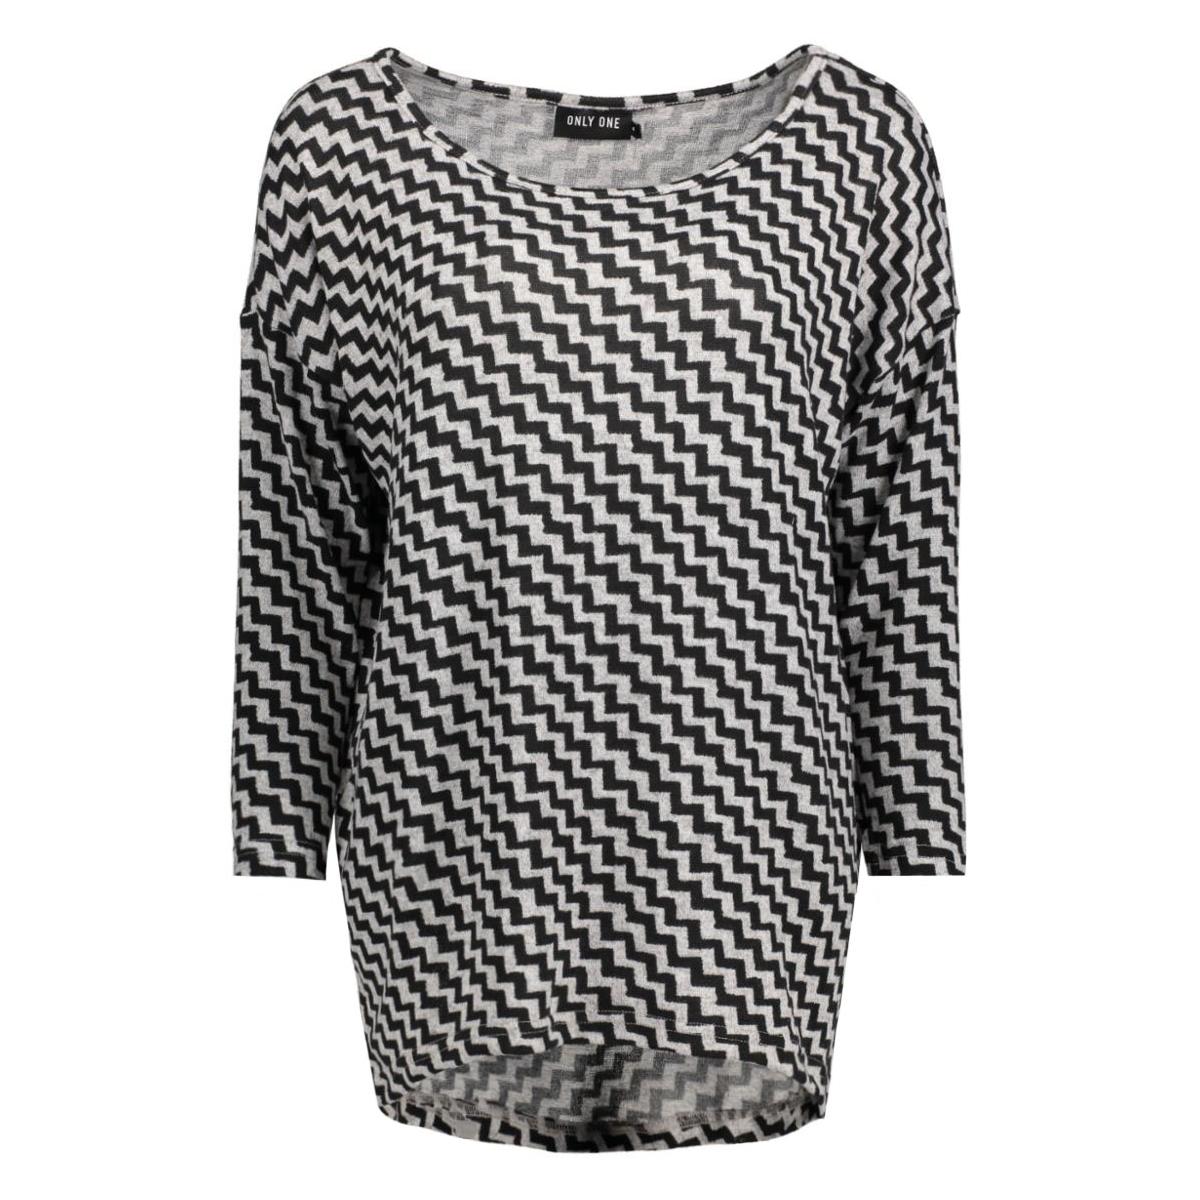 onlelcos anne 4/5 top jrs 15133165 only t-shirt light grey/ black